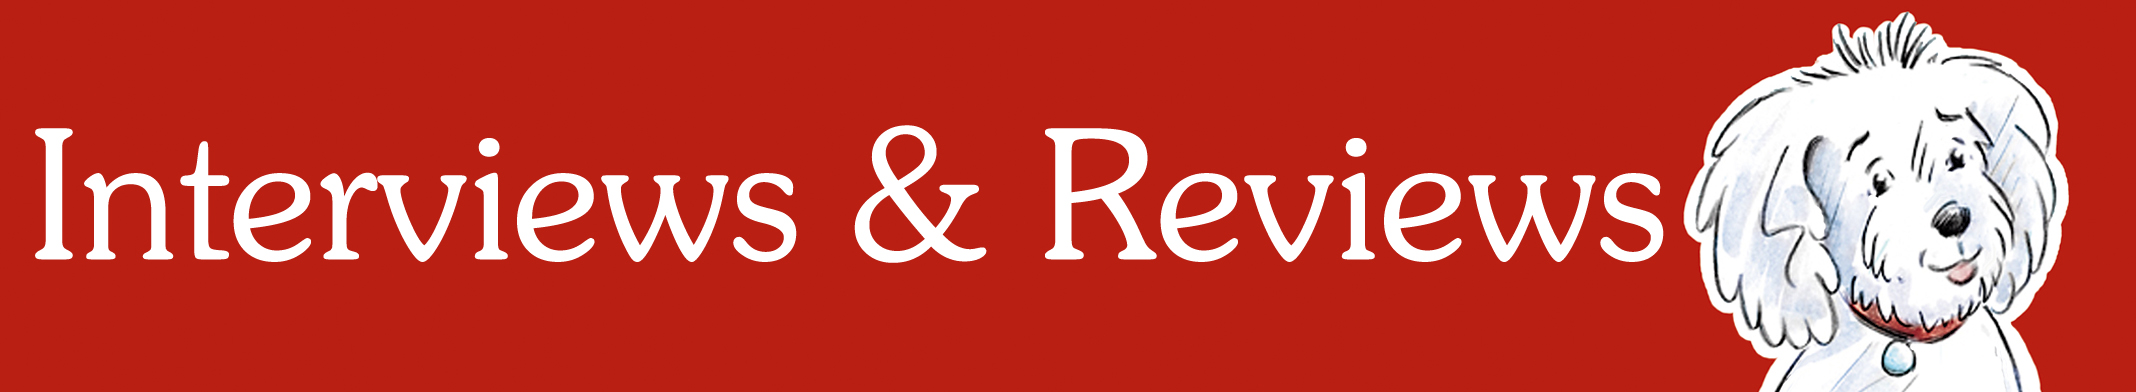 Interviews & Reviews